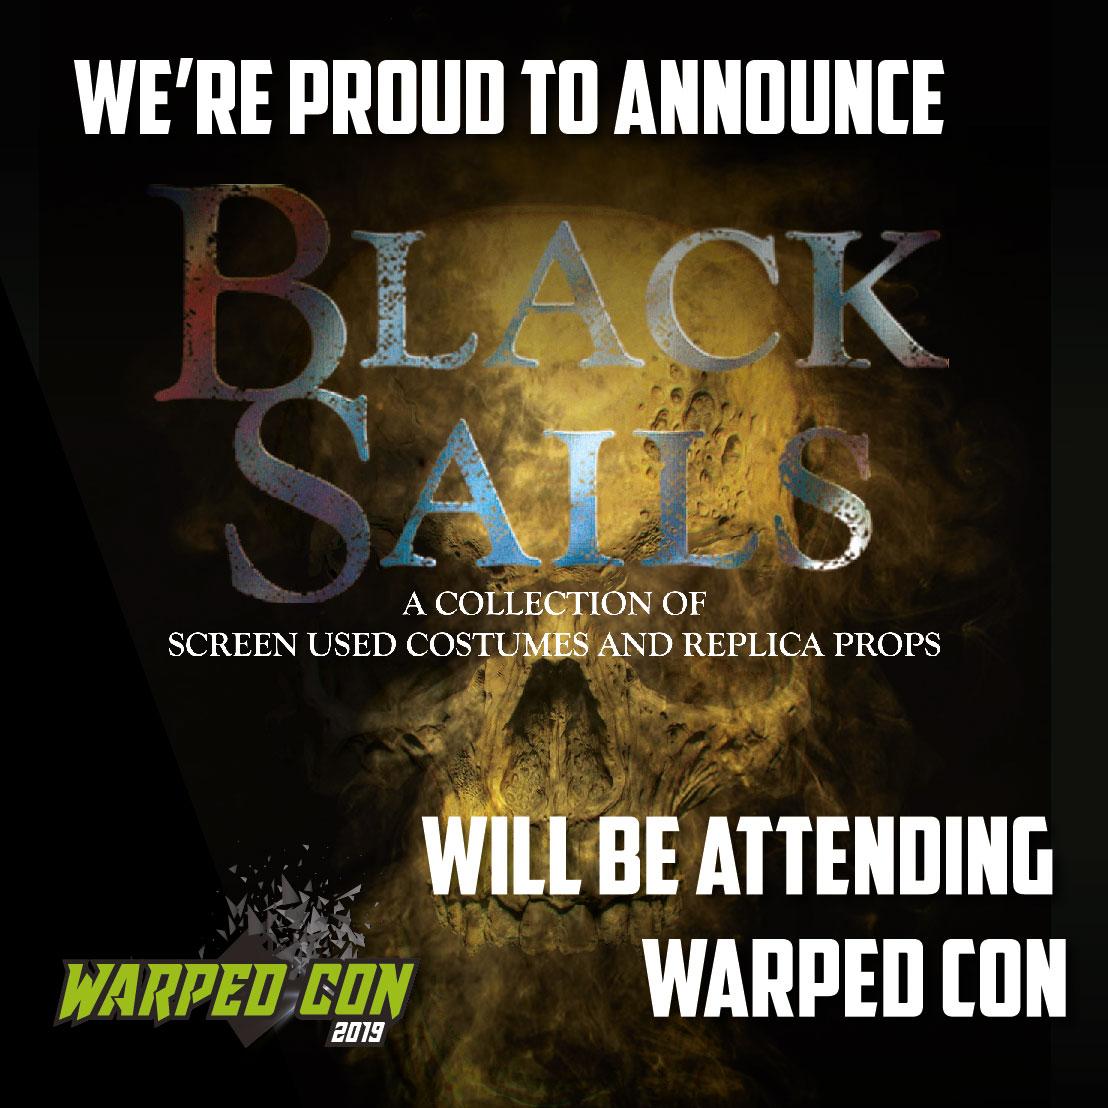 back sails guest image in black squared